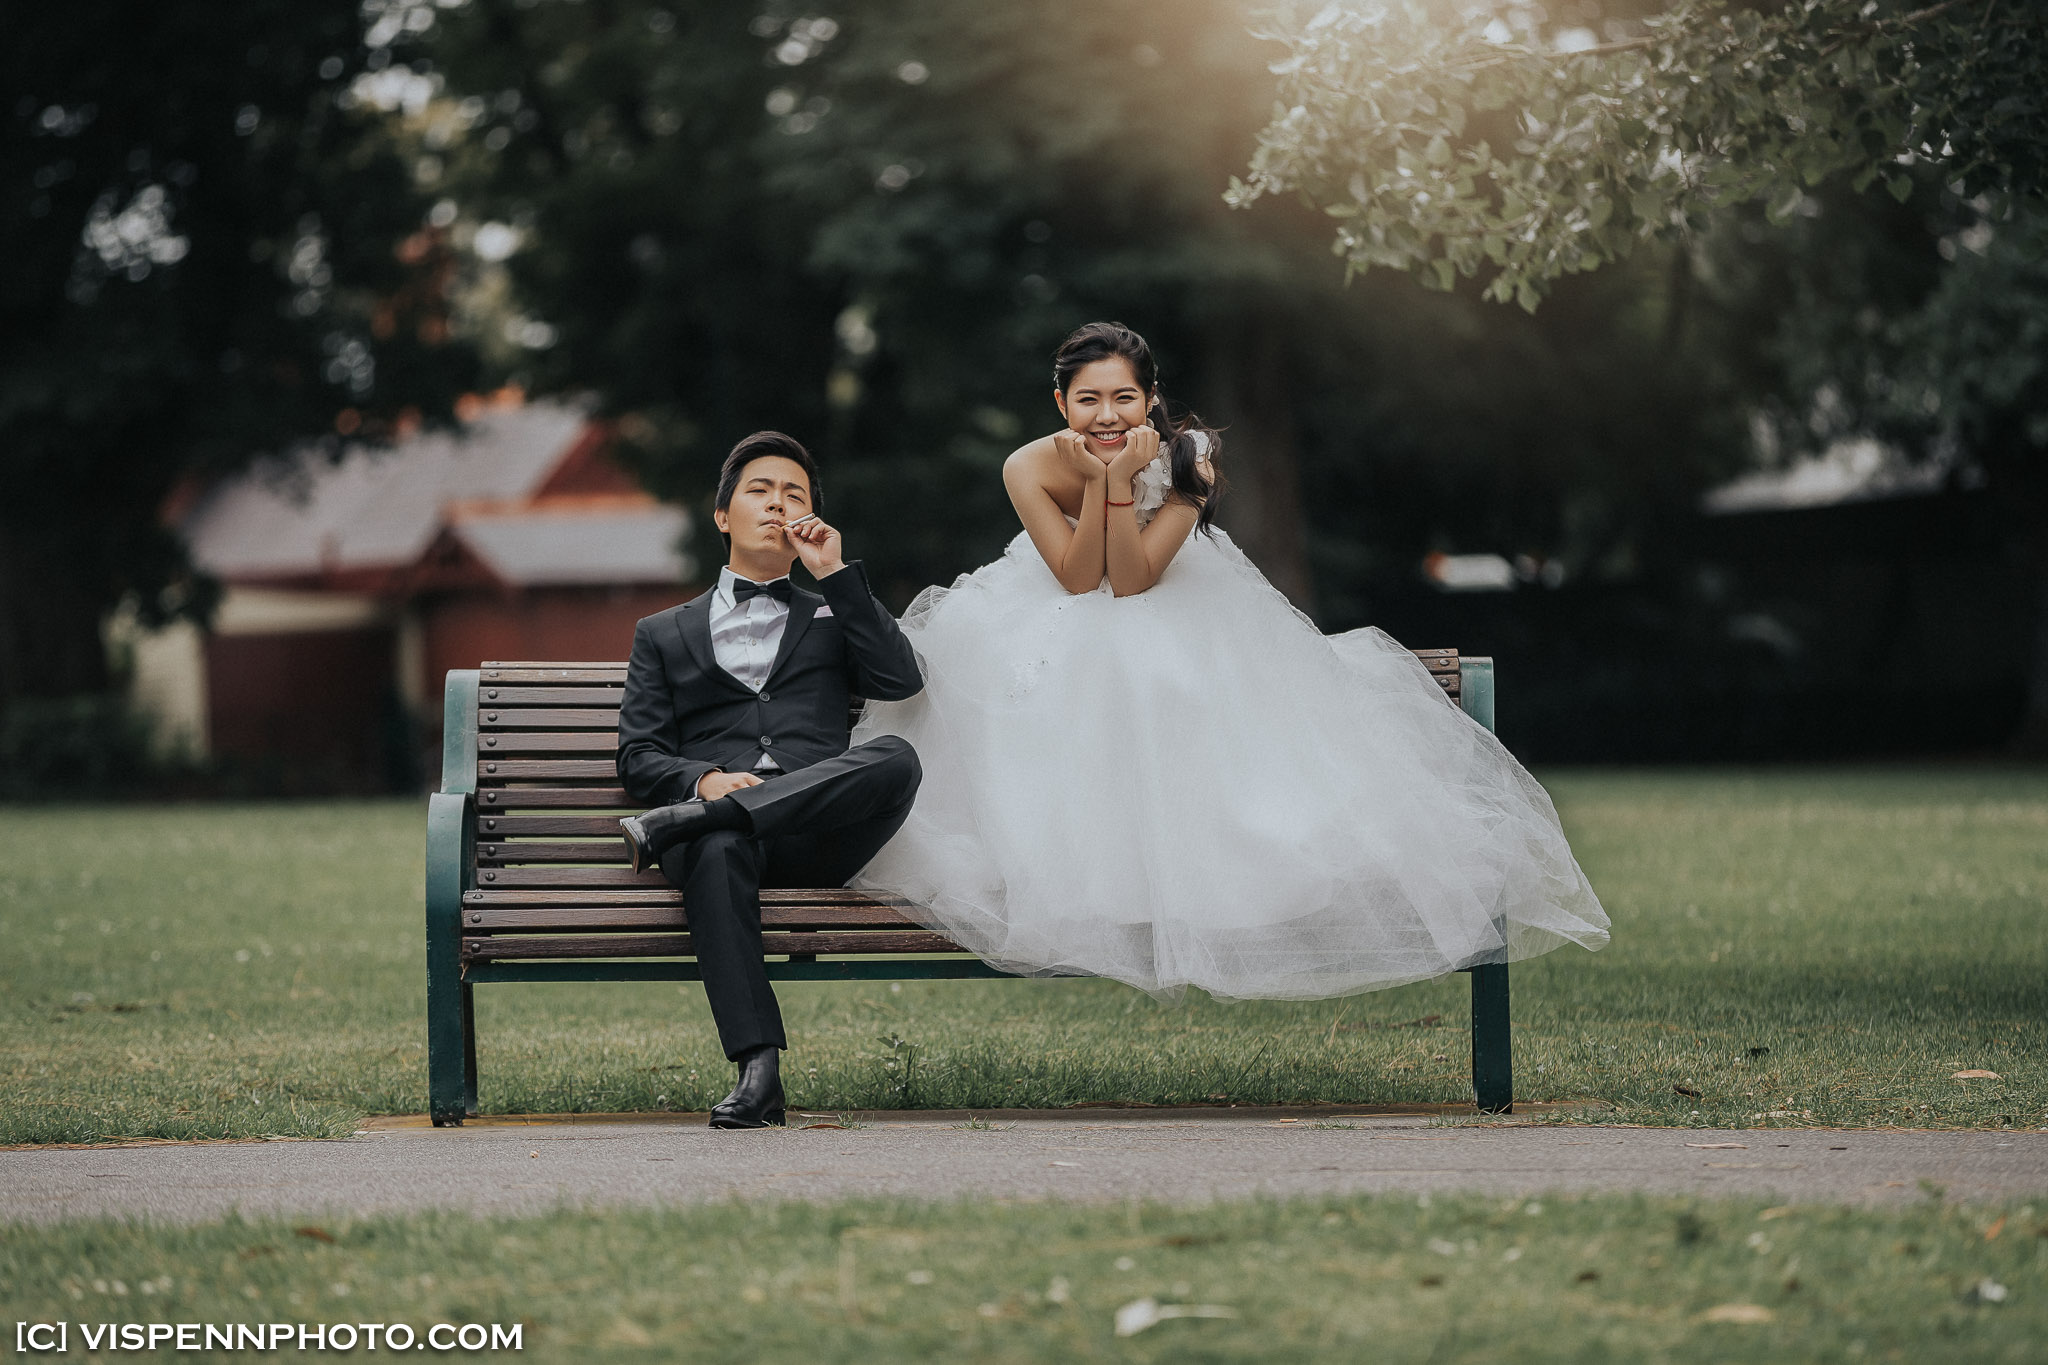 PRE WEDDING Photography Melbourne VISPENN 墨尔本 婚纱照 结婚照 婚纱摄影 1DX 0610